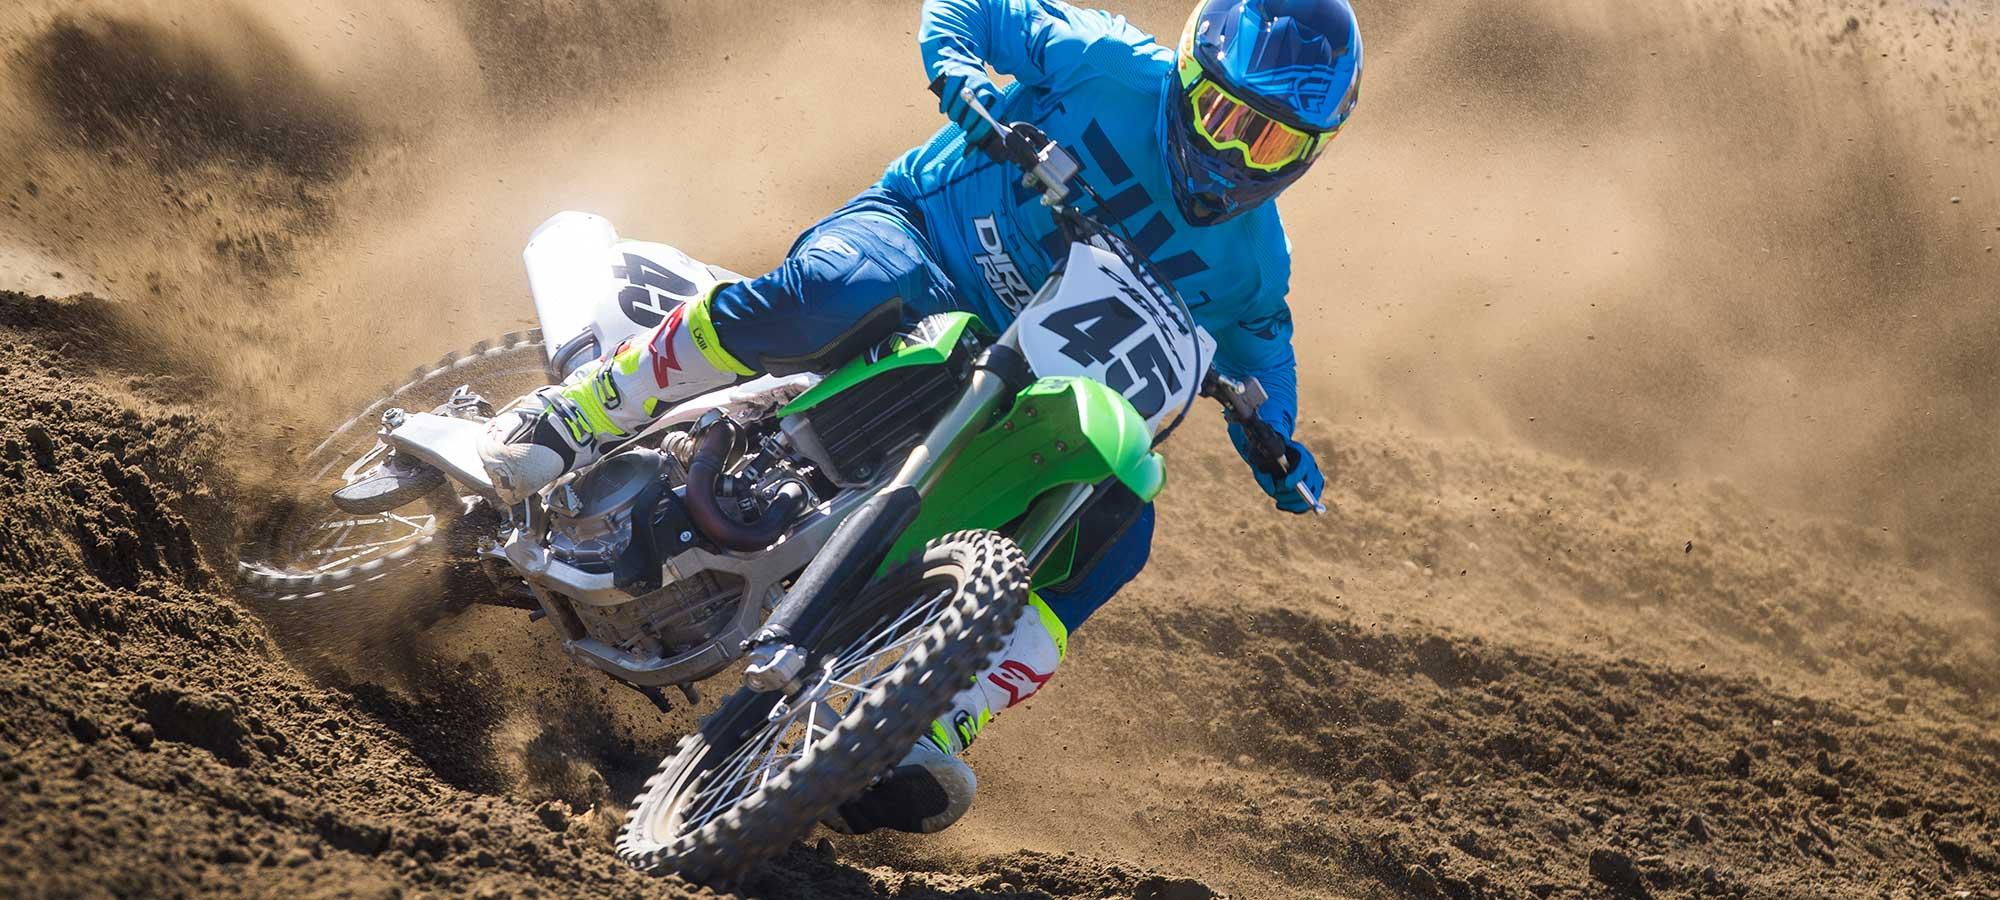 35 Hours On The 2019 Kawasaki KX450   Dirt Rider